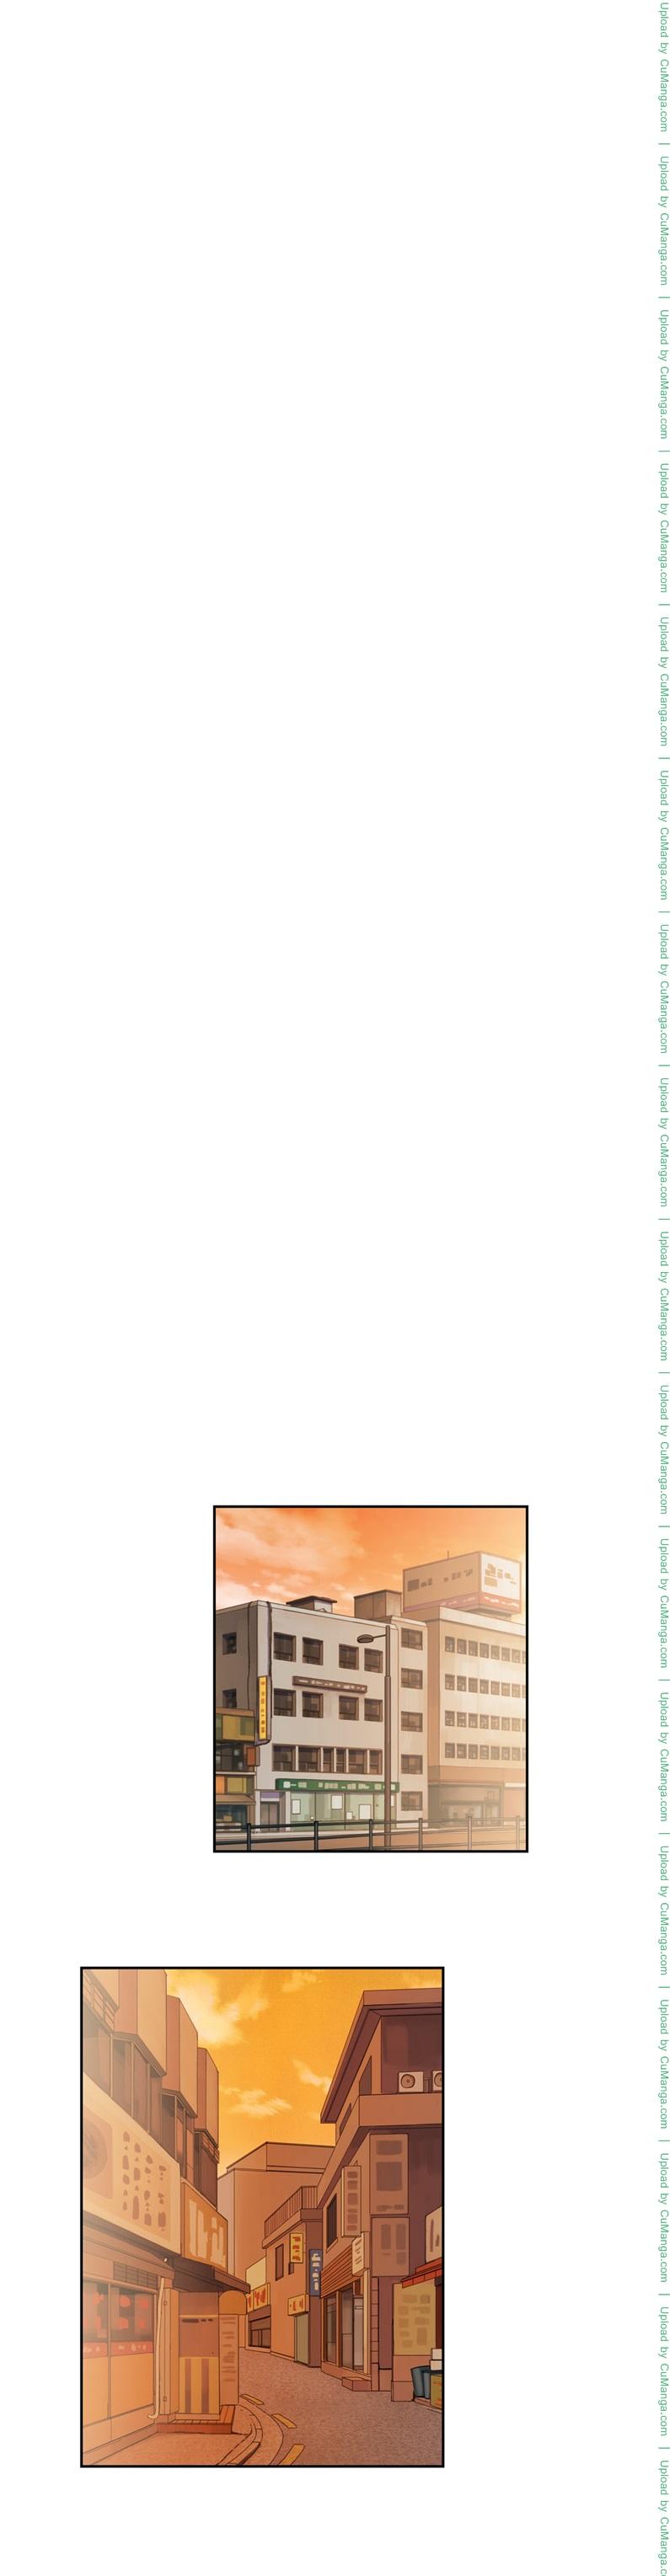 SStudy 45 - หน้า 11